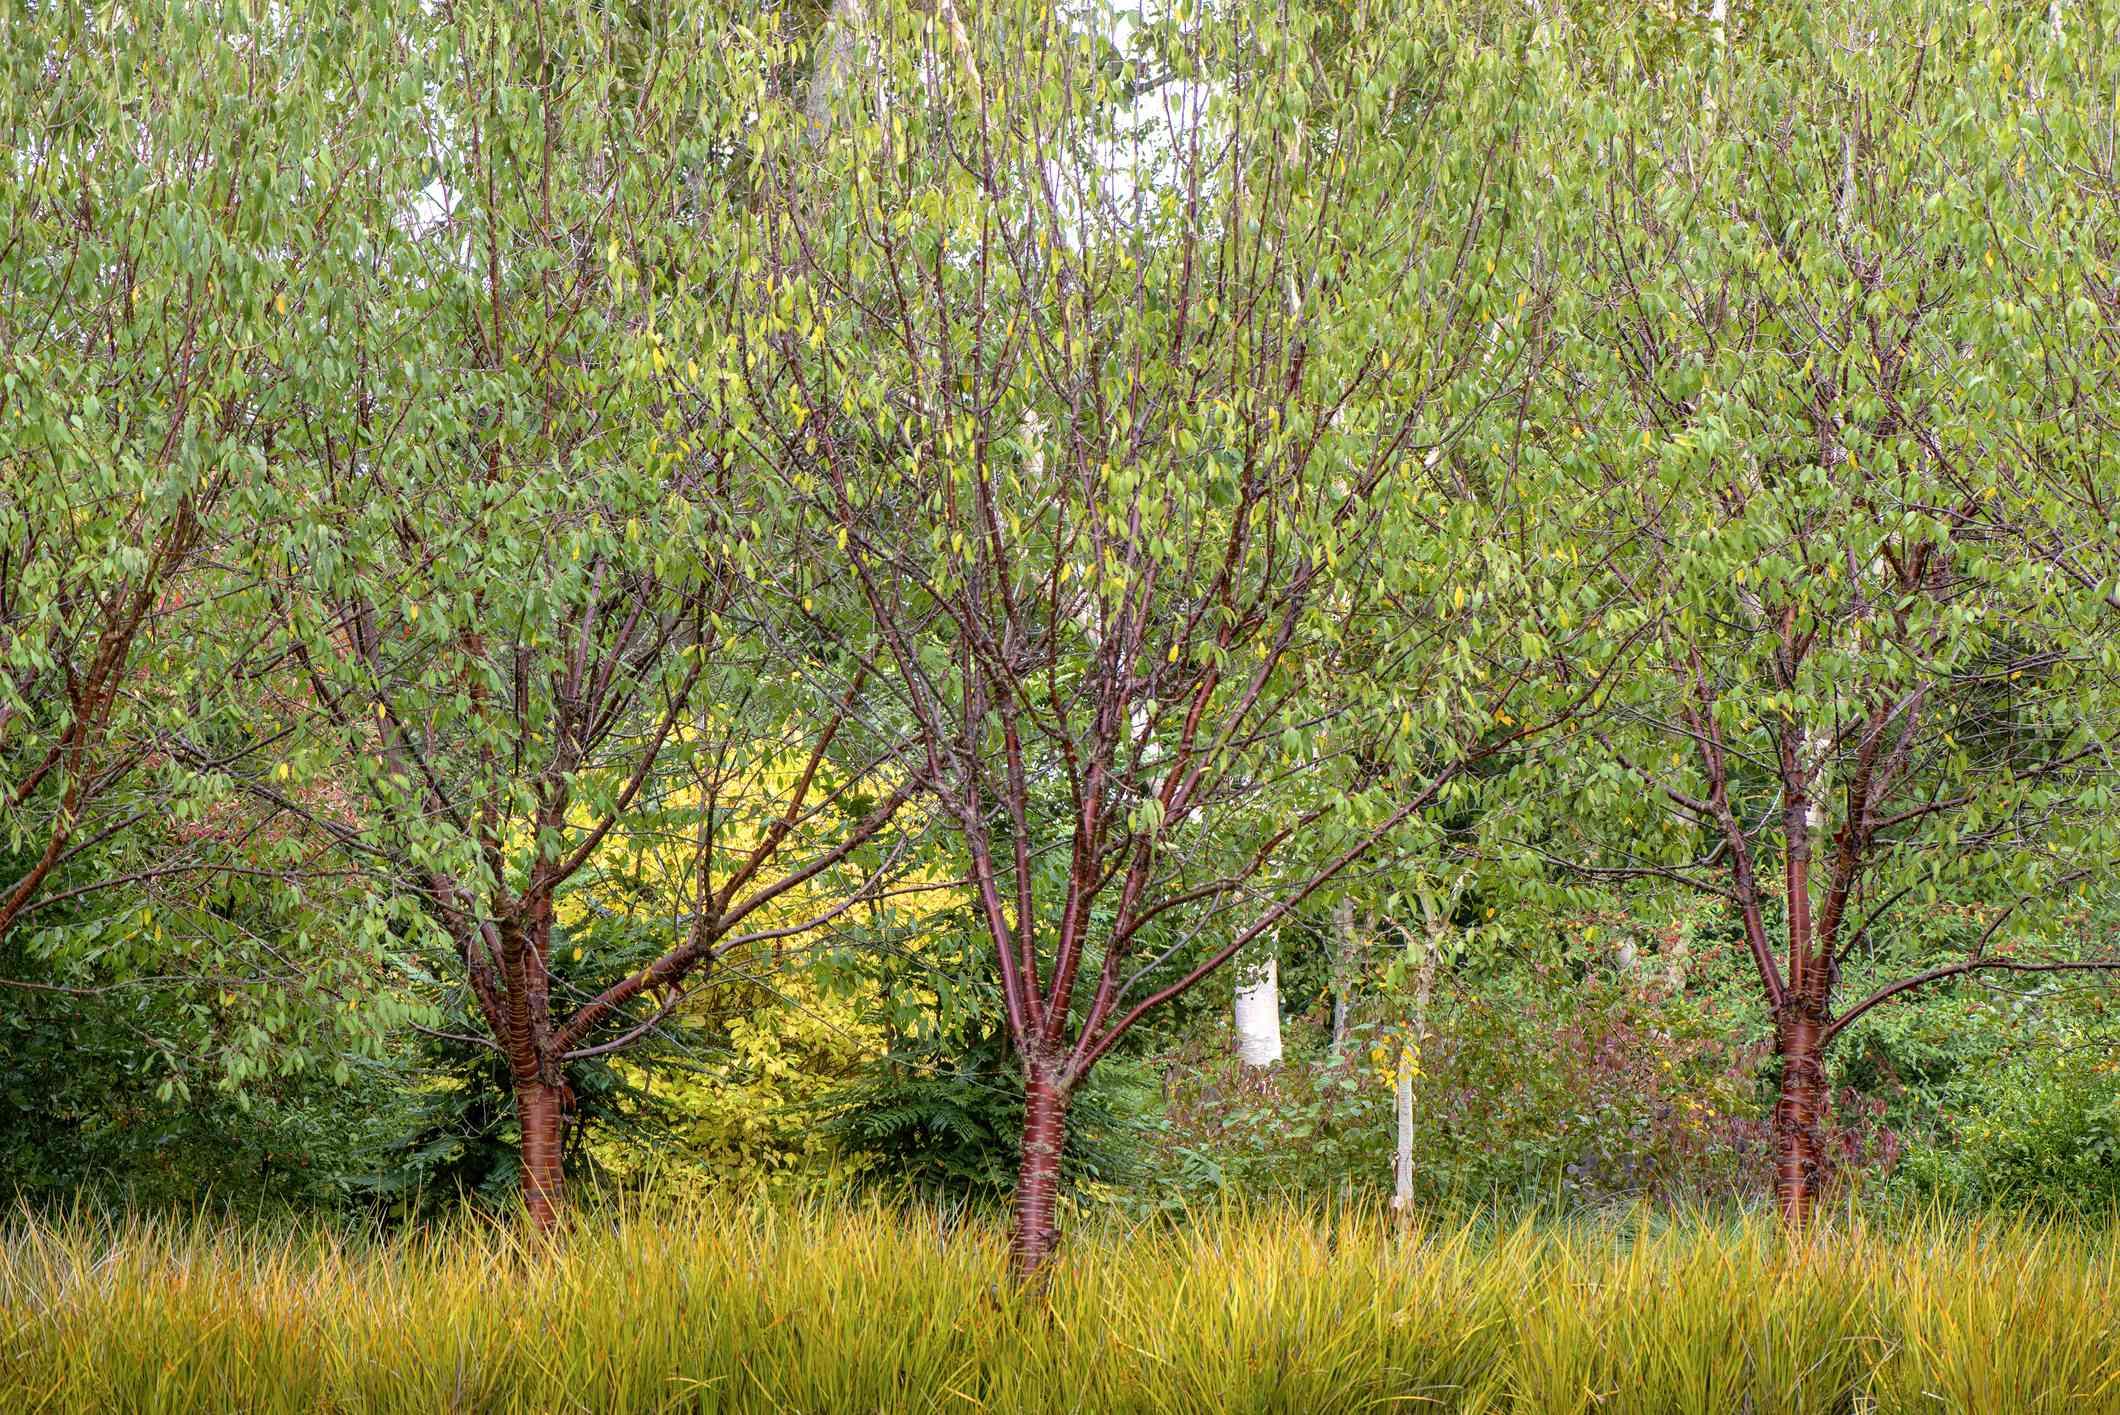 Libertia peregrinans 'Gold Leaf' planted underneath Prunus serrula trees, also called birch bark cherry, birchbark cherry, paperbark cherry, or Tibetan cherry